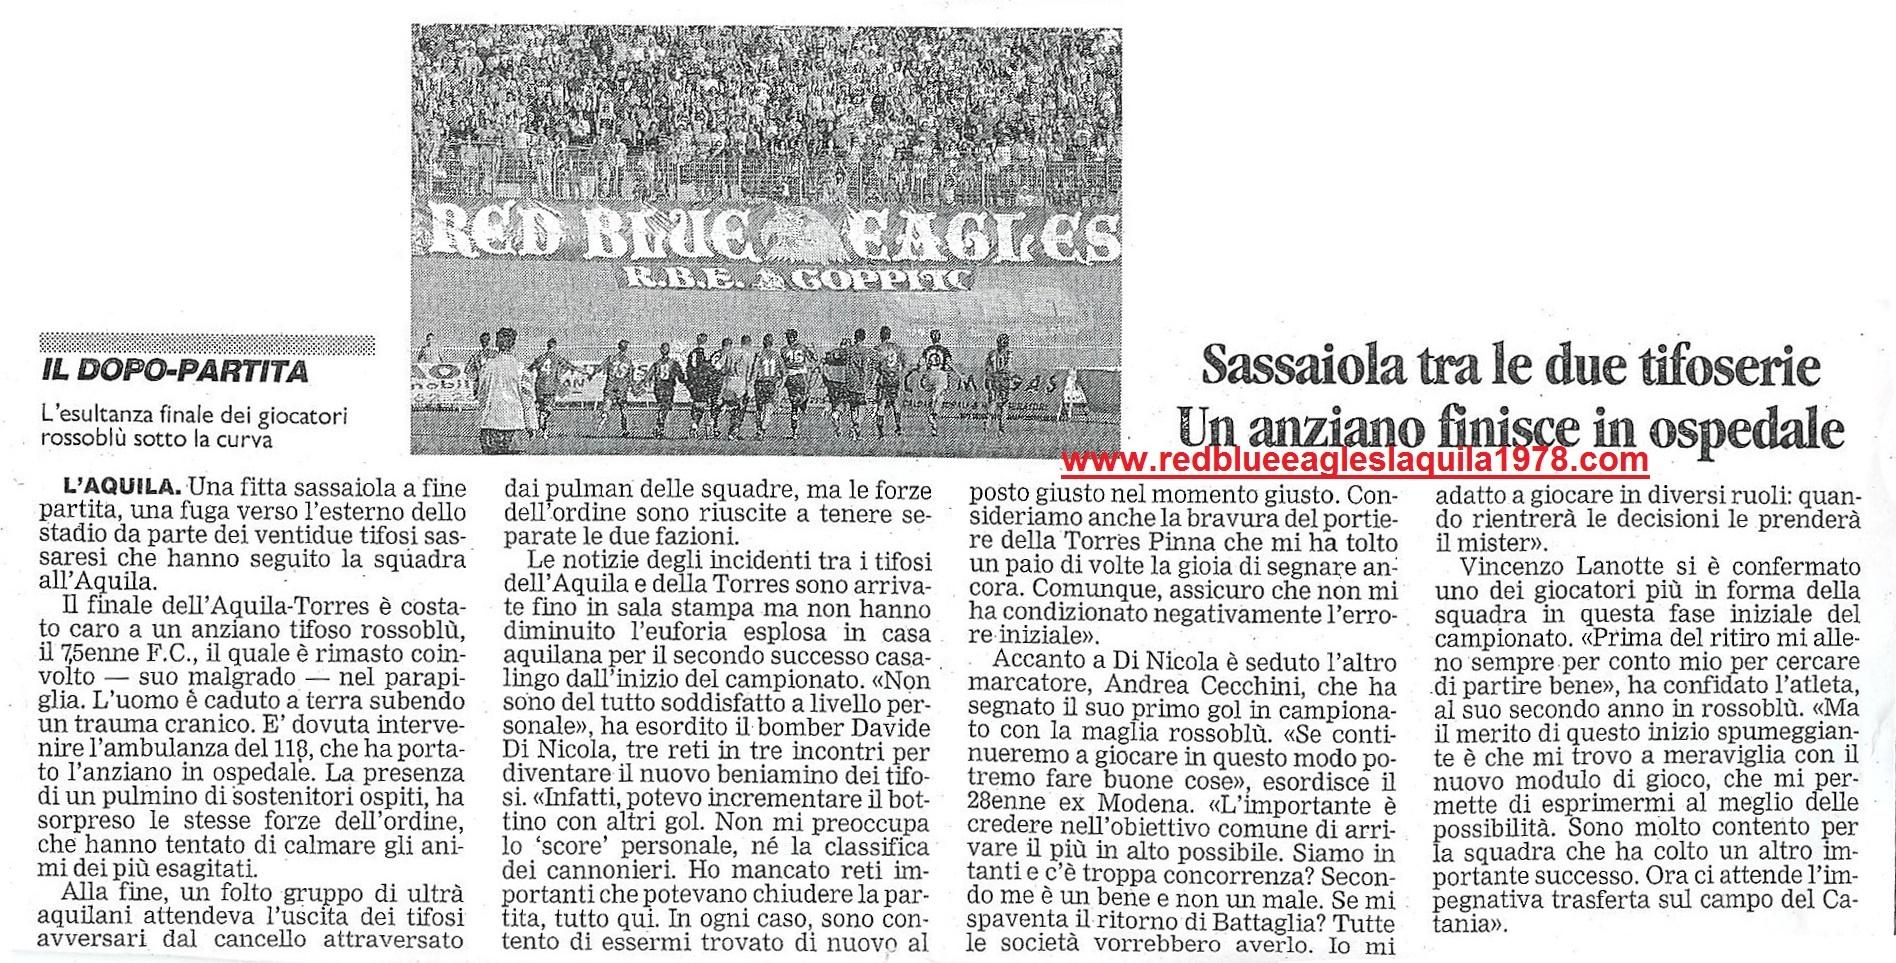 Sassaiola contro i tifosi ospiti in L'Aquila-Torres 17 Settembre 2000 serie C1